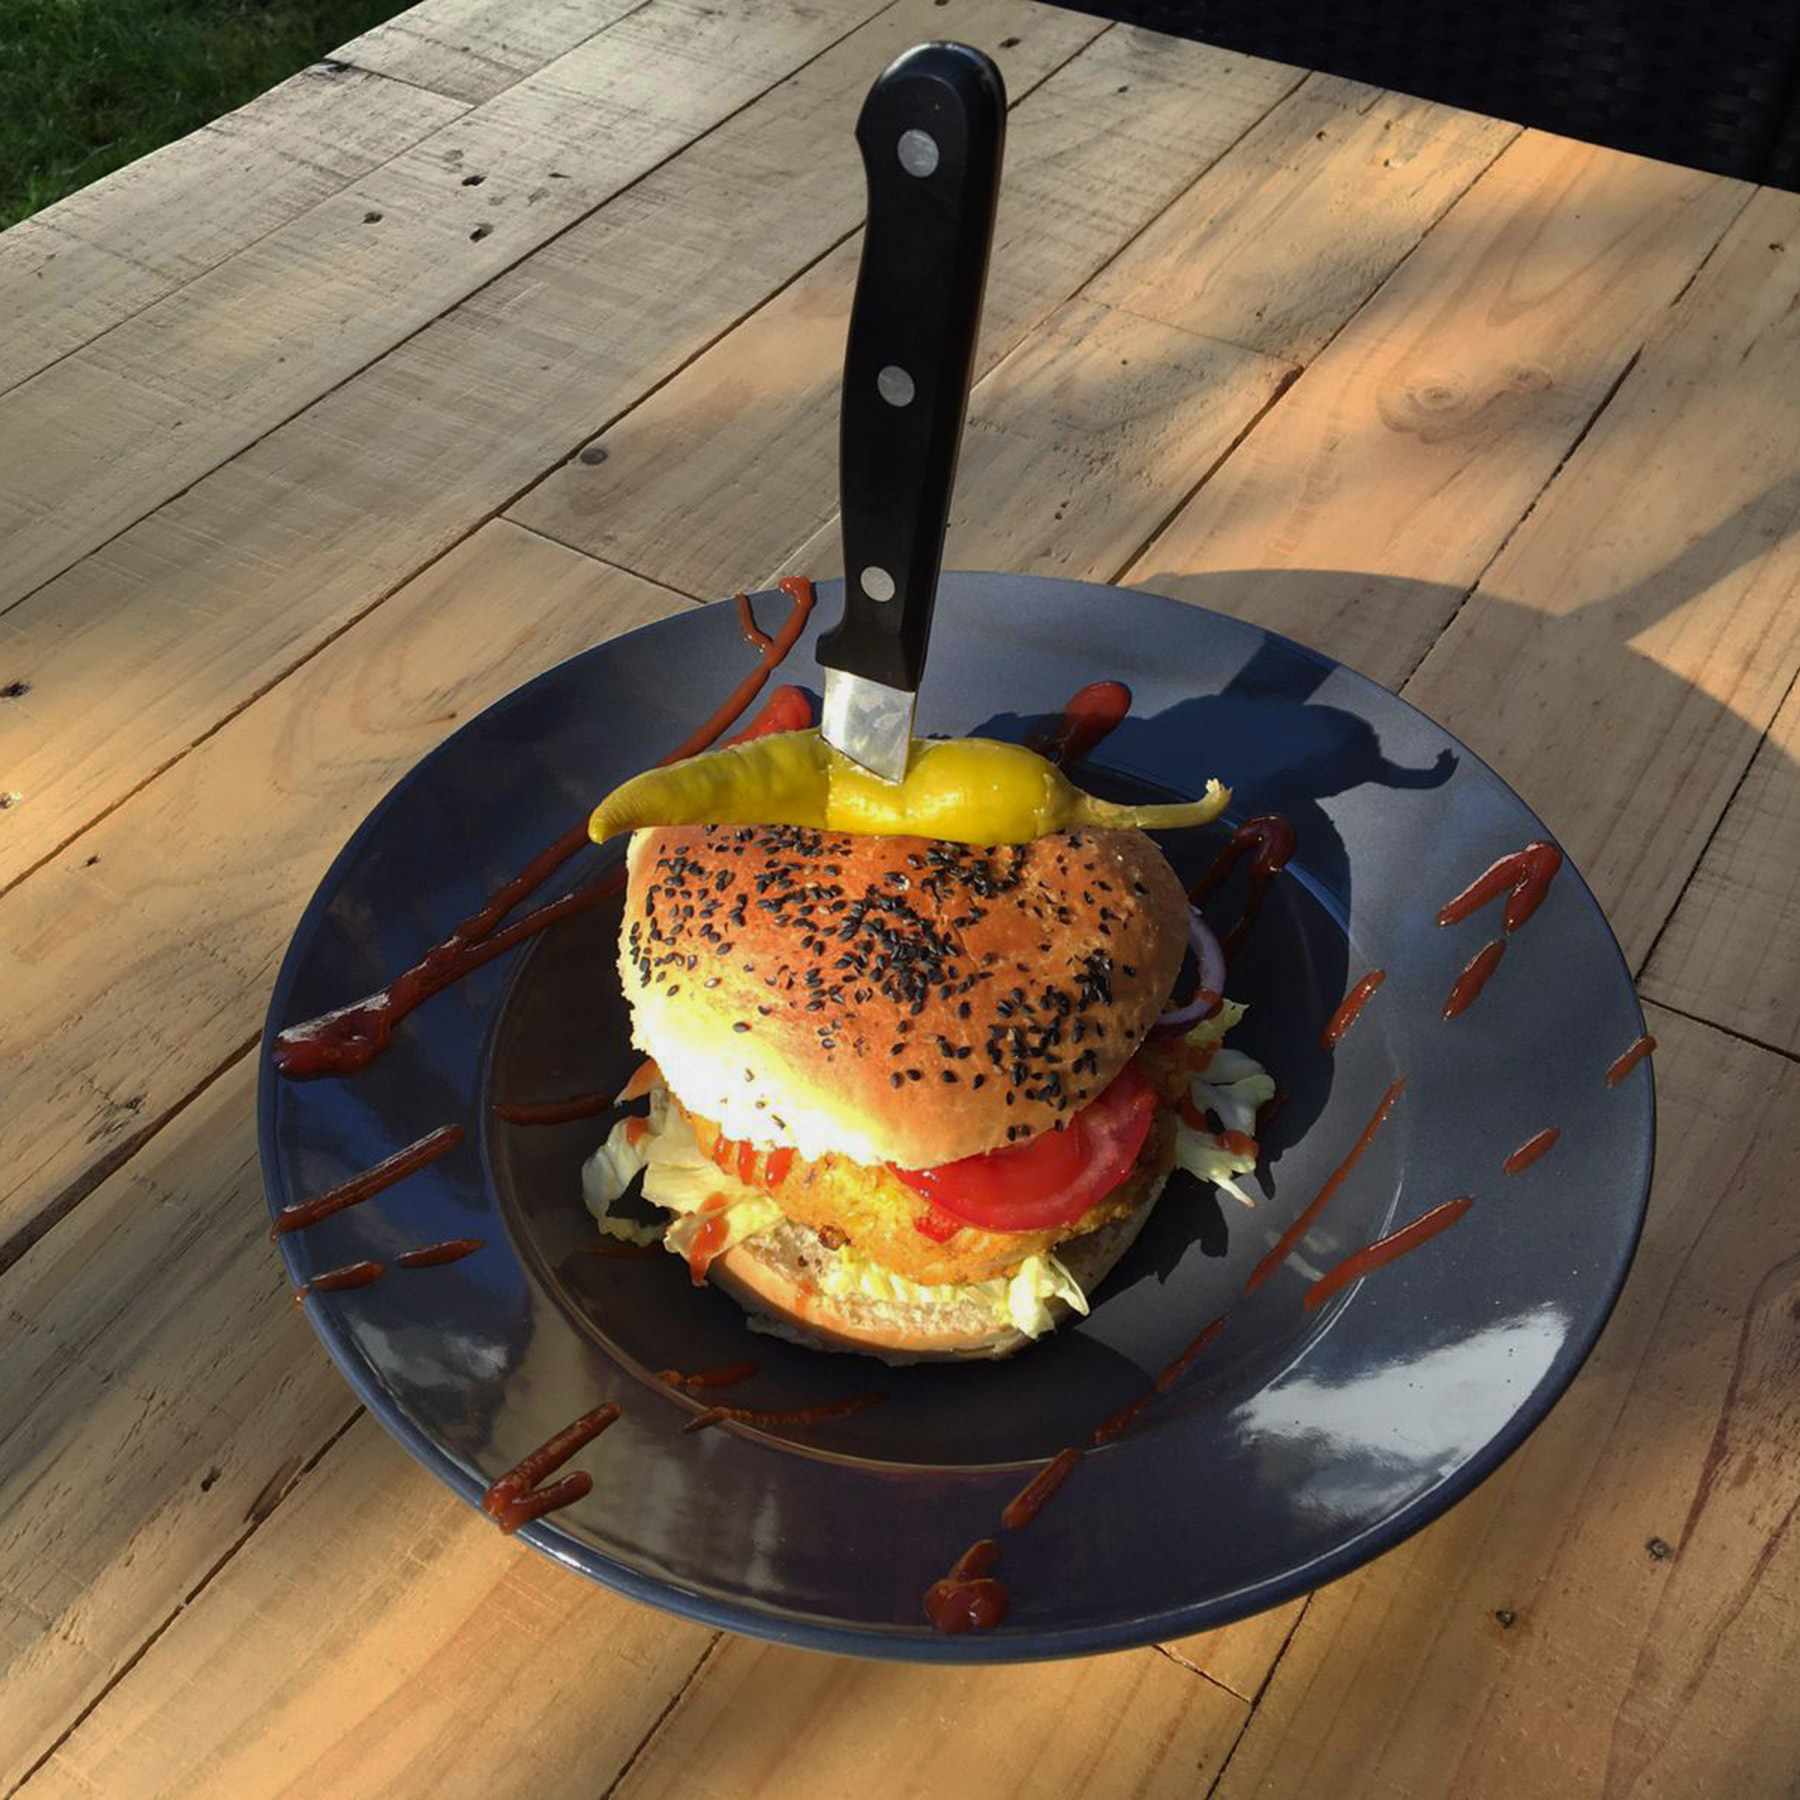 Vegan chili burger sin carne